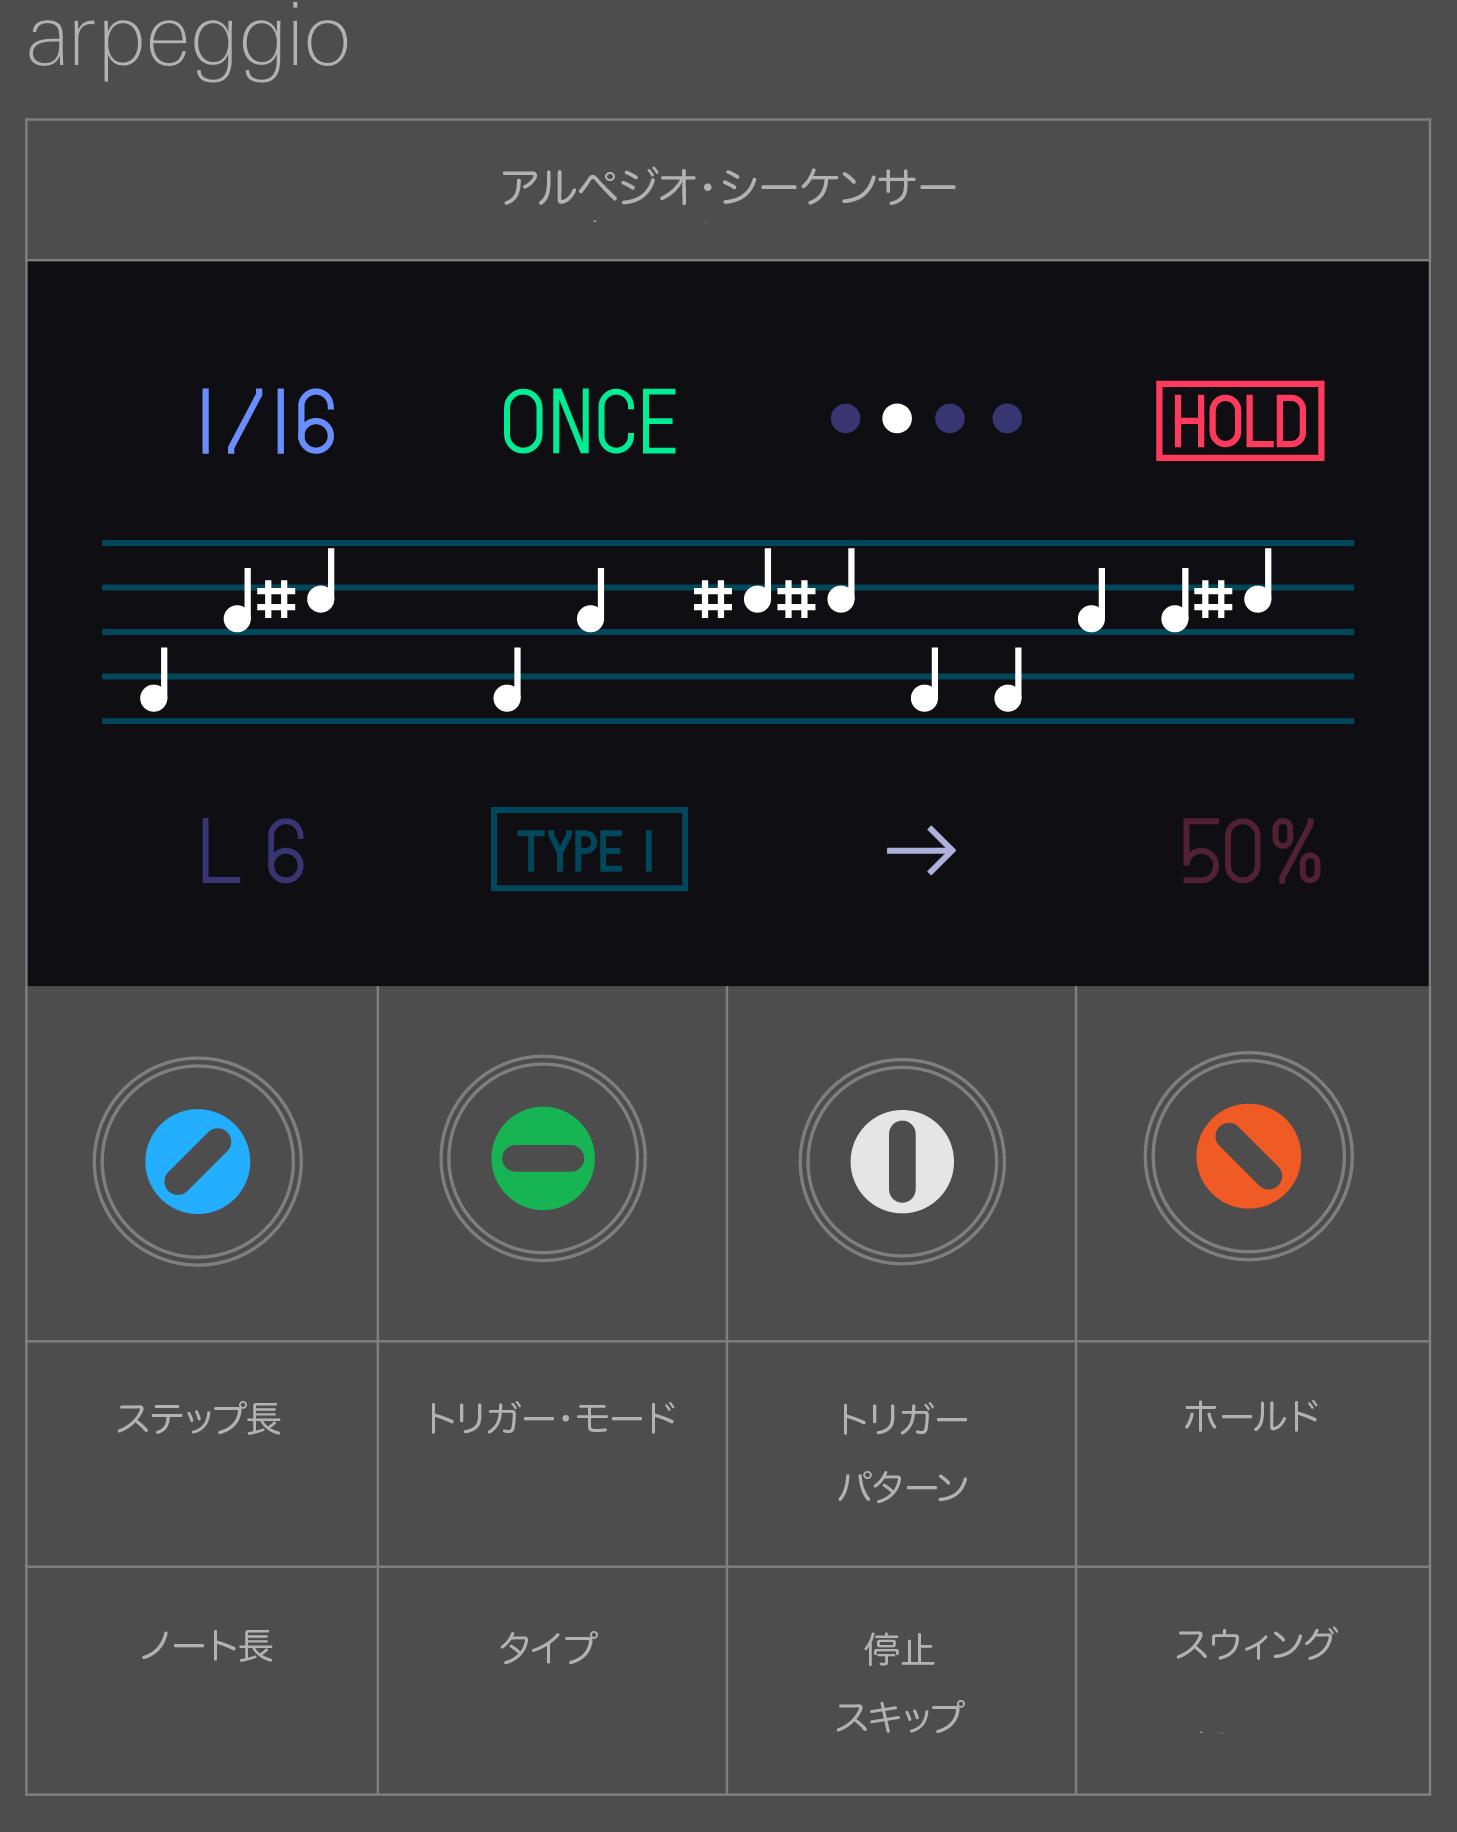 20170421_te_op-1_218_arpeggio_jp